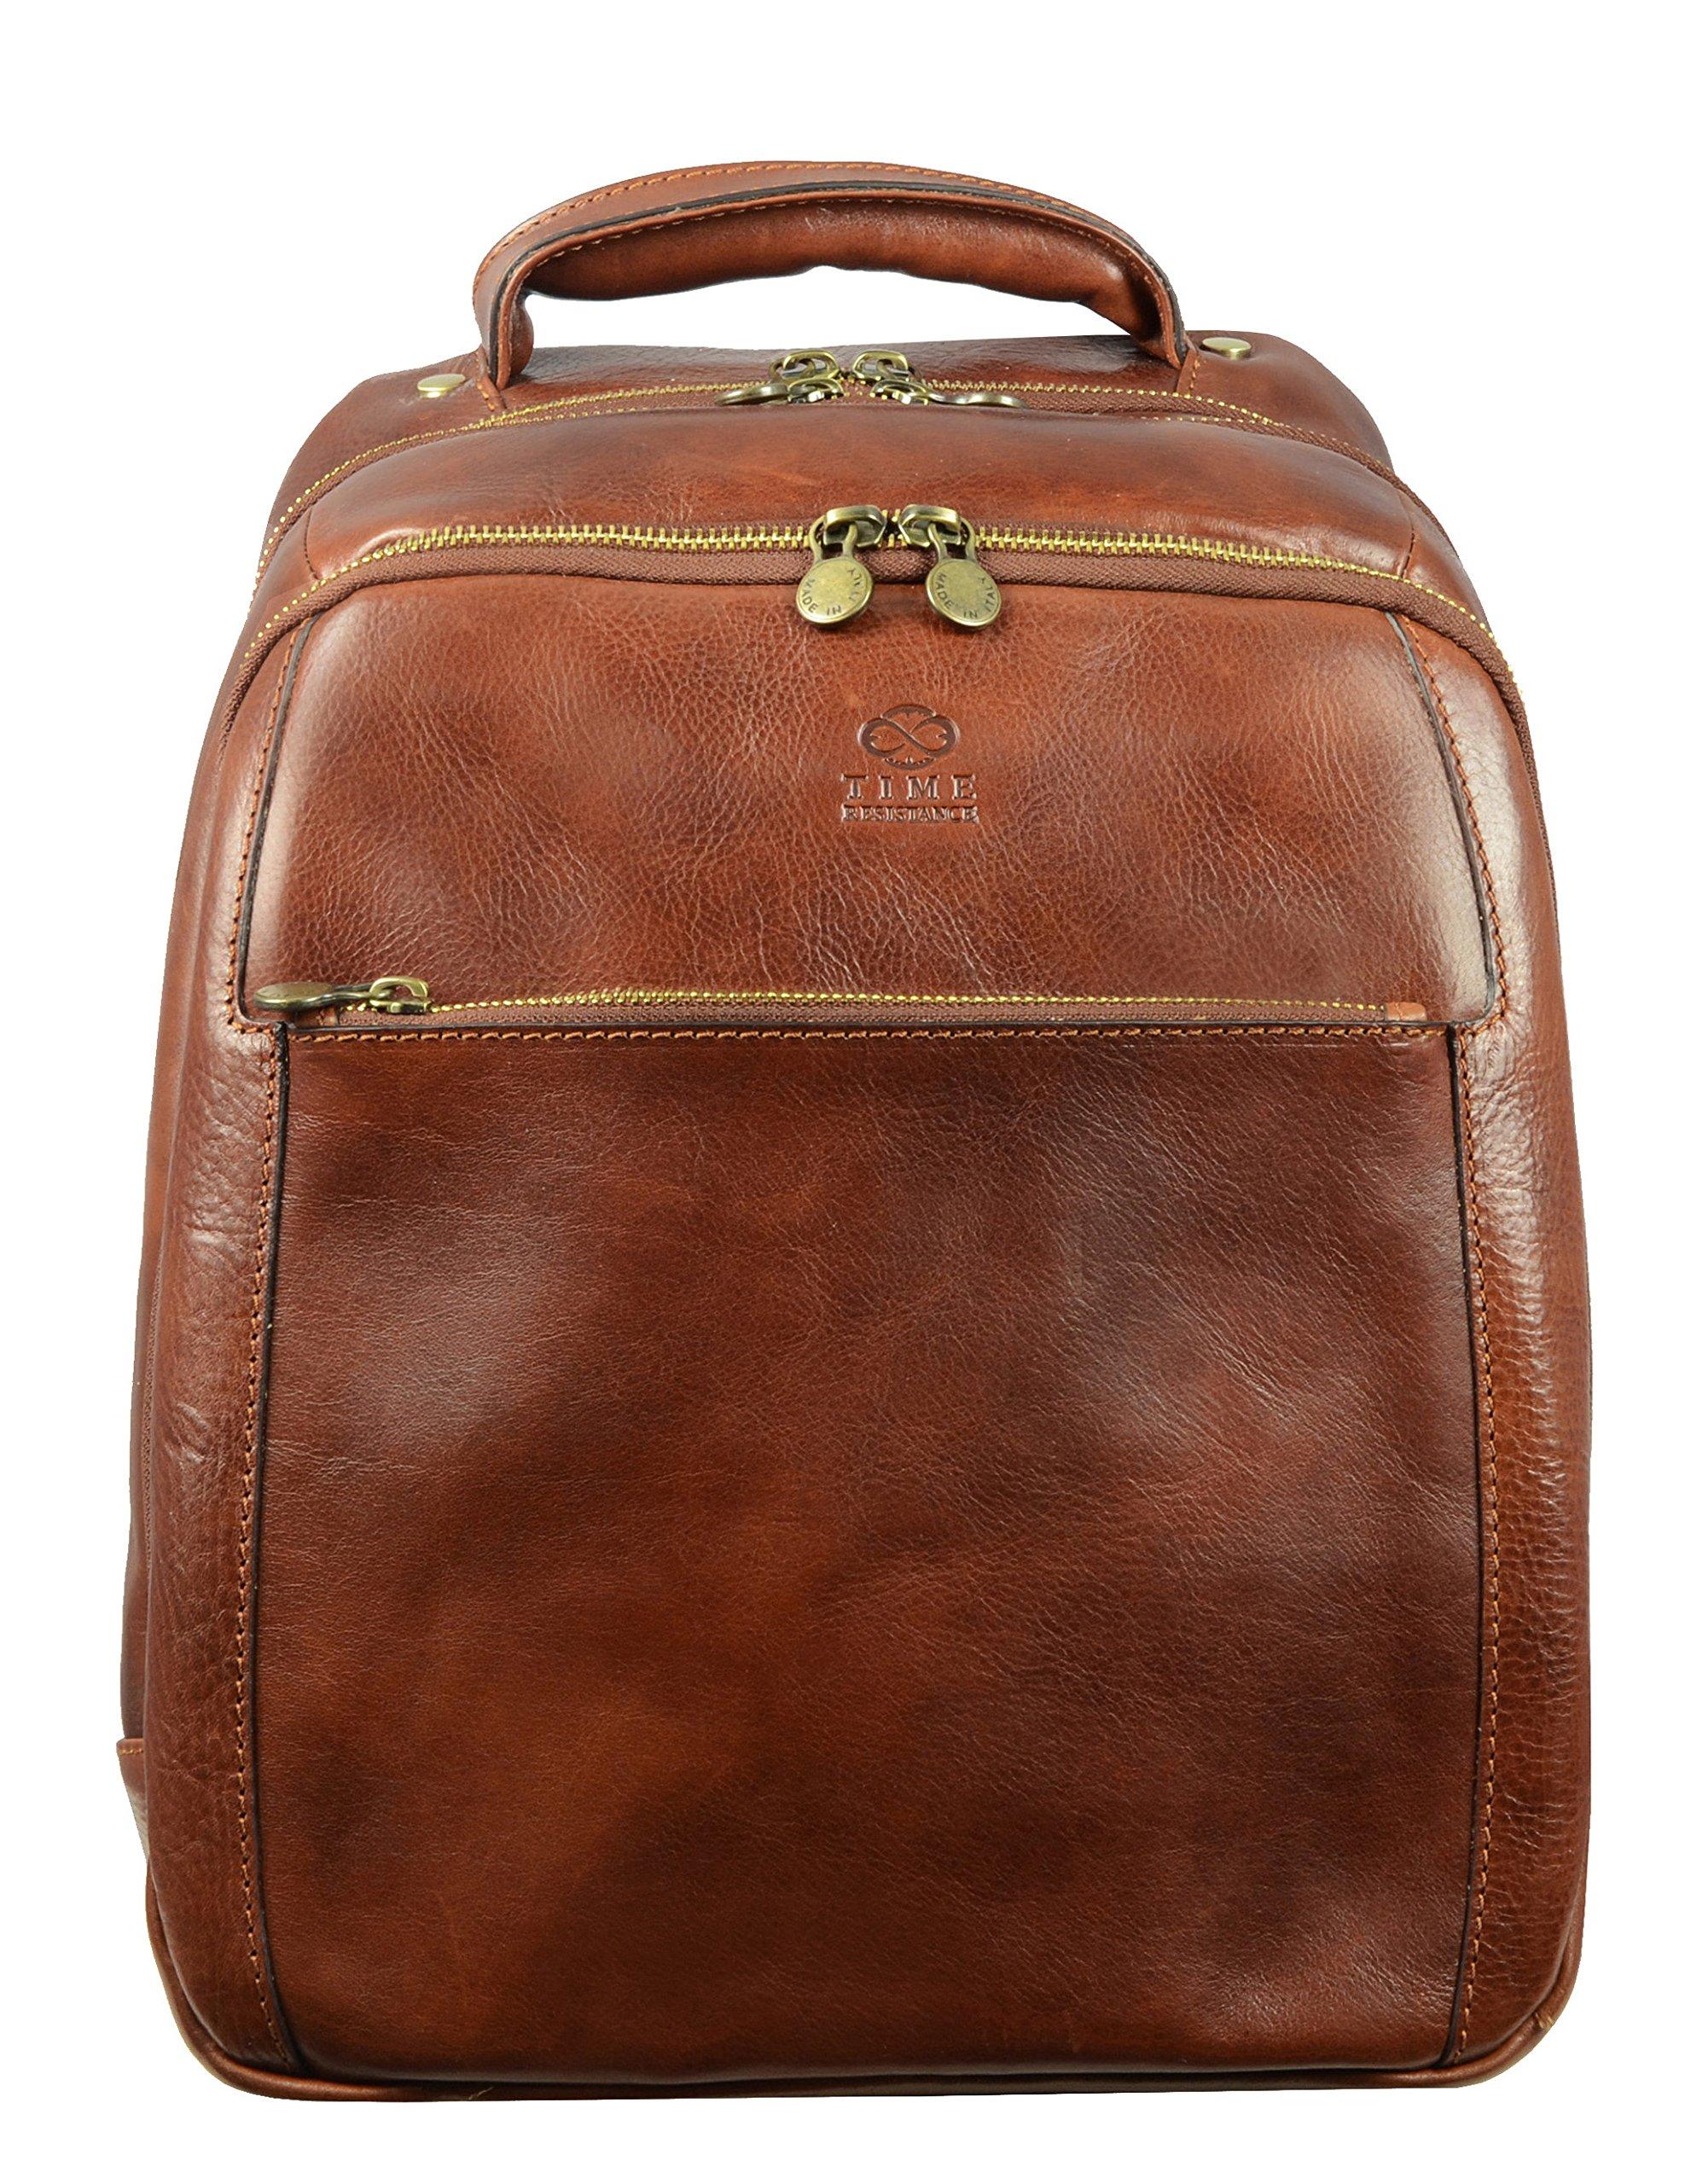 Full Grain Leather Backpack Rucksack School Bag Brown Medium Unisex - Time Resistance